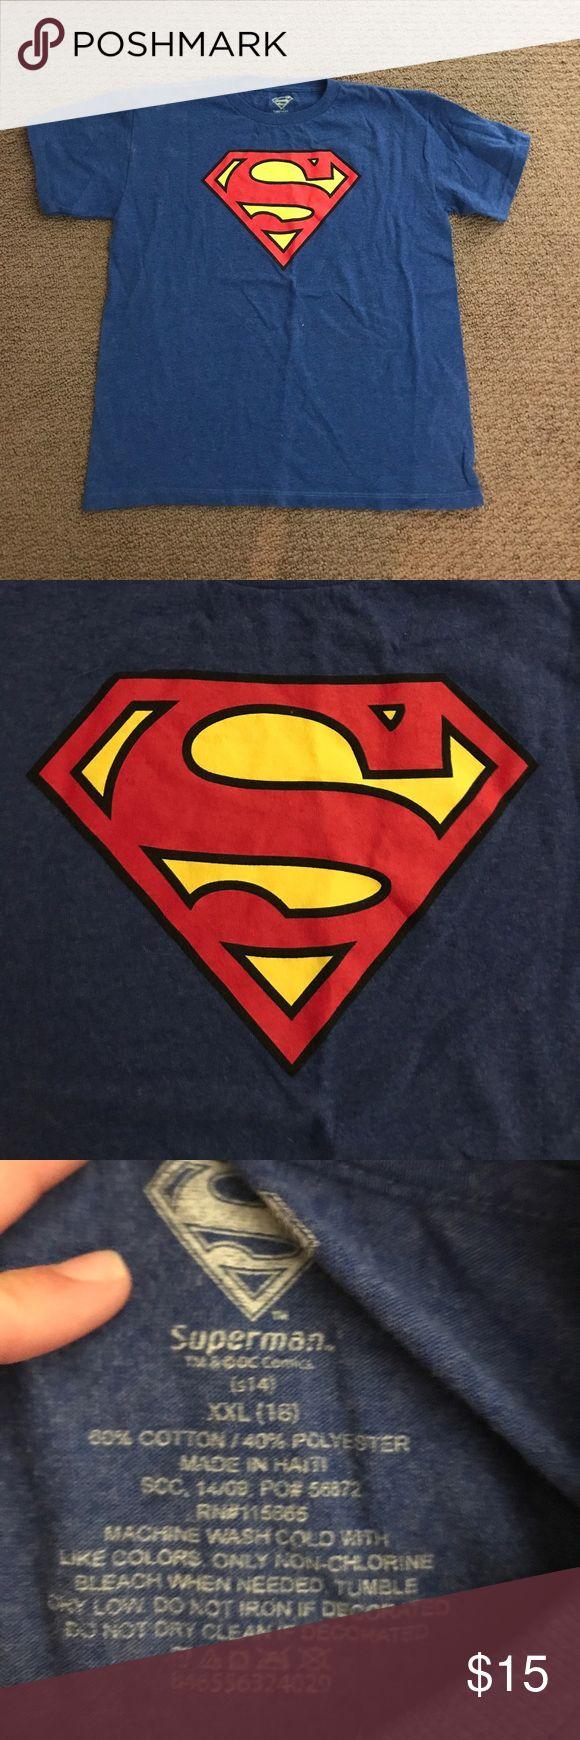 Children's size superman t shirt! Youth XXL blue superman t shirt superman Tops Tees - Short Sleeve